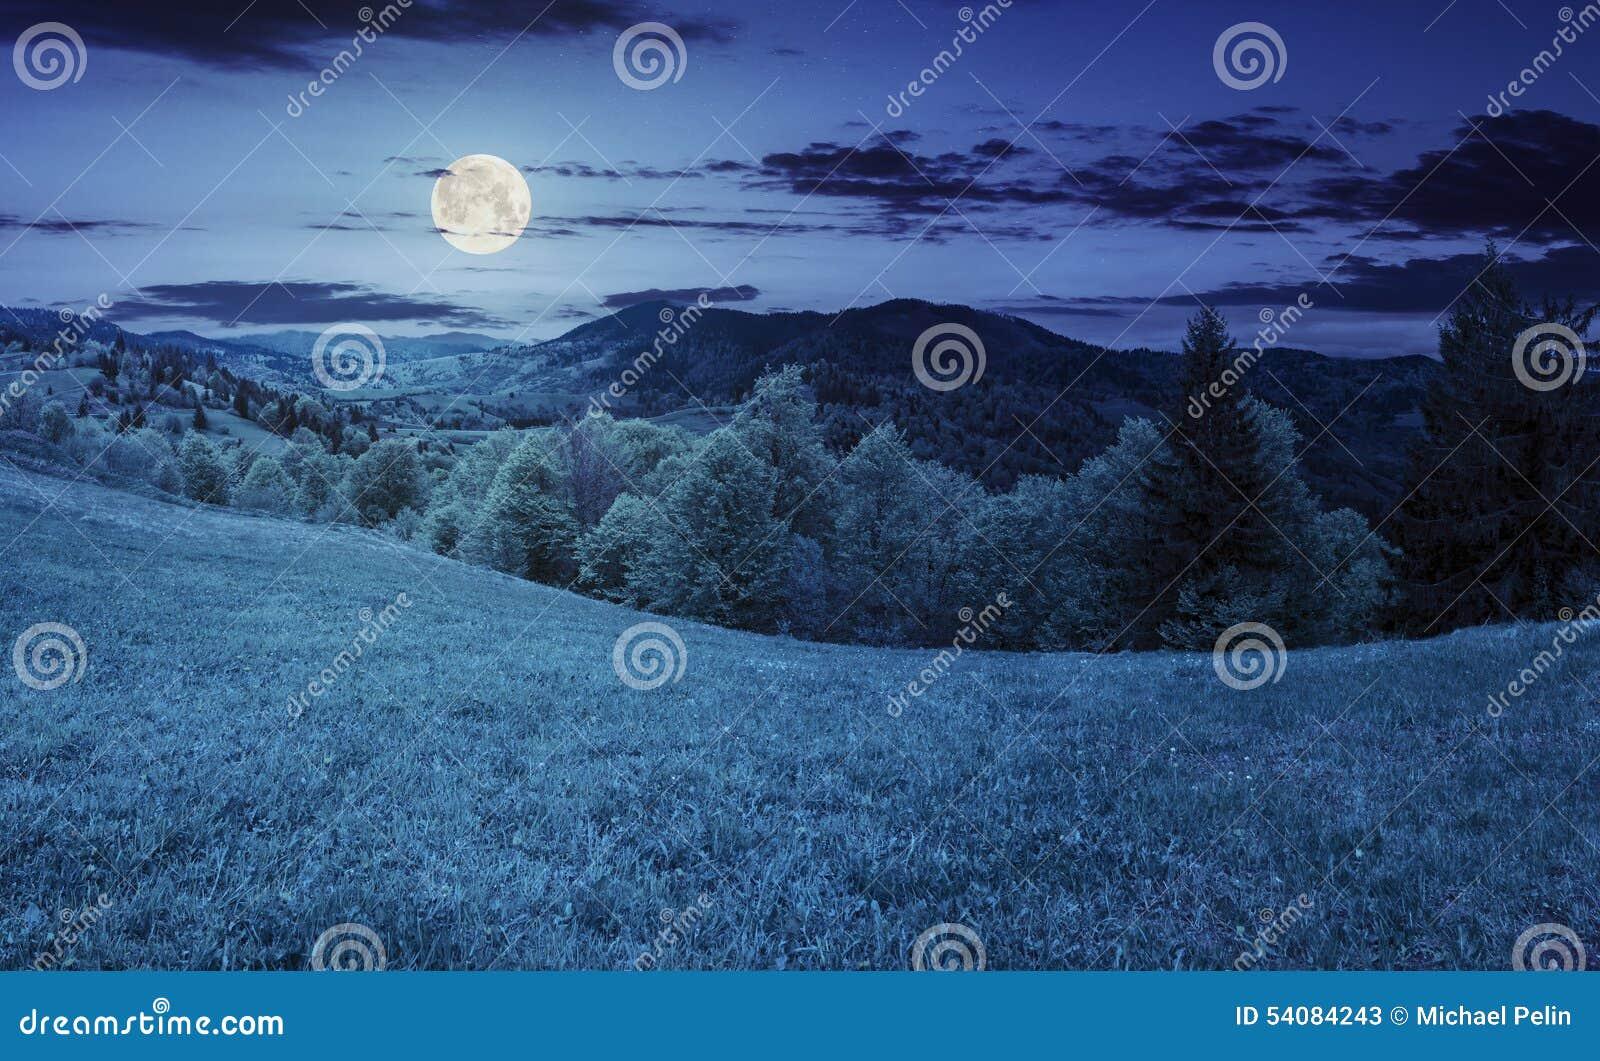 Hellingsweide dichtbij bos in berg bij nacht